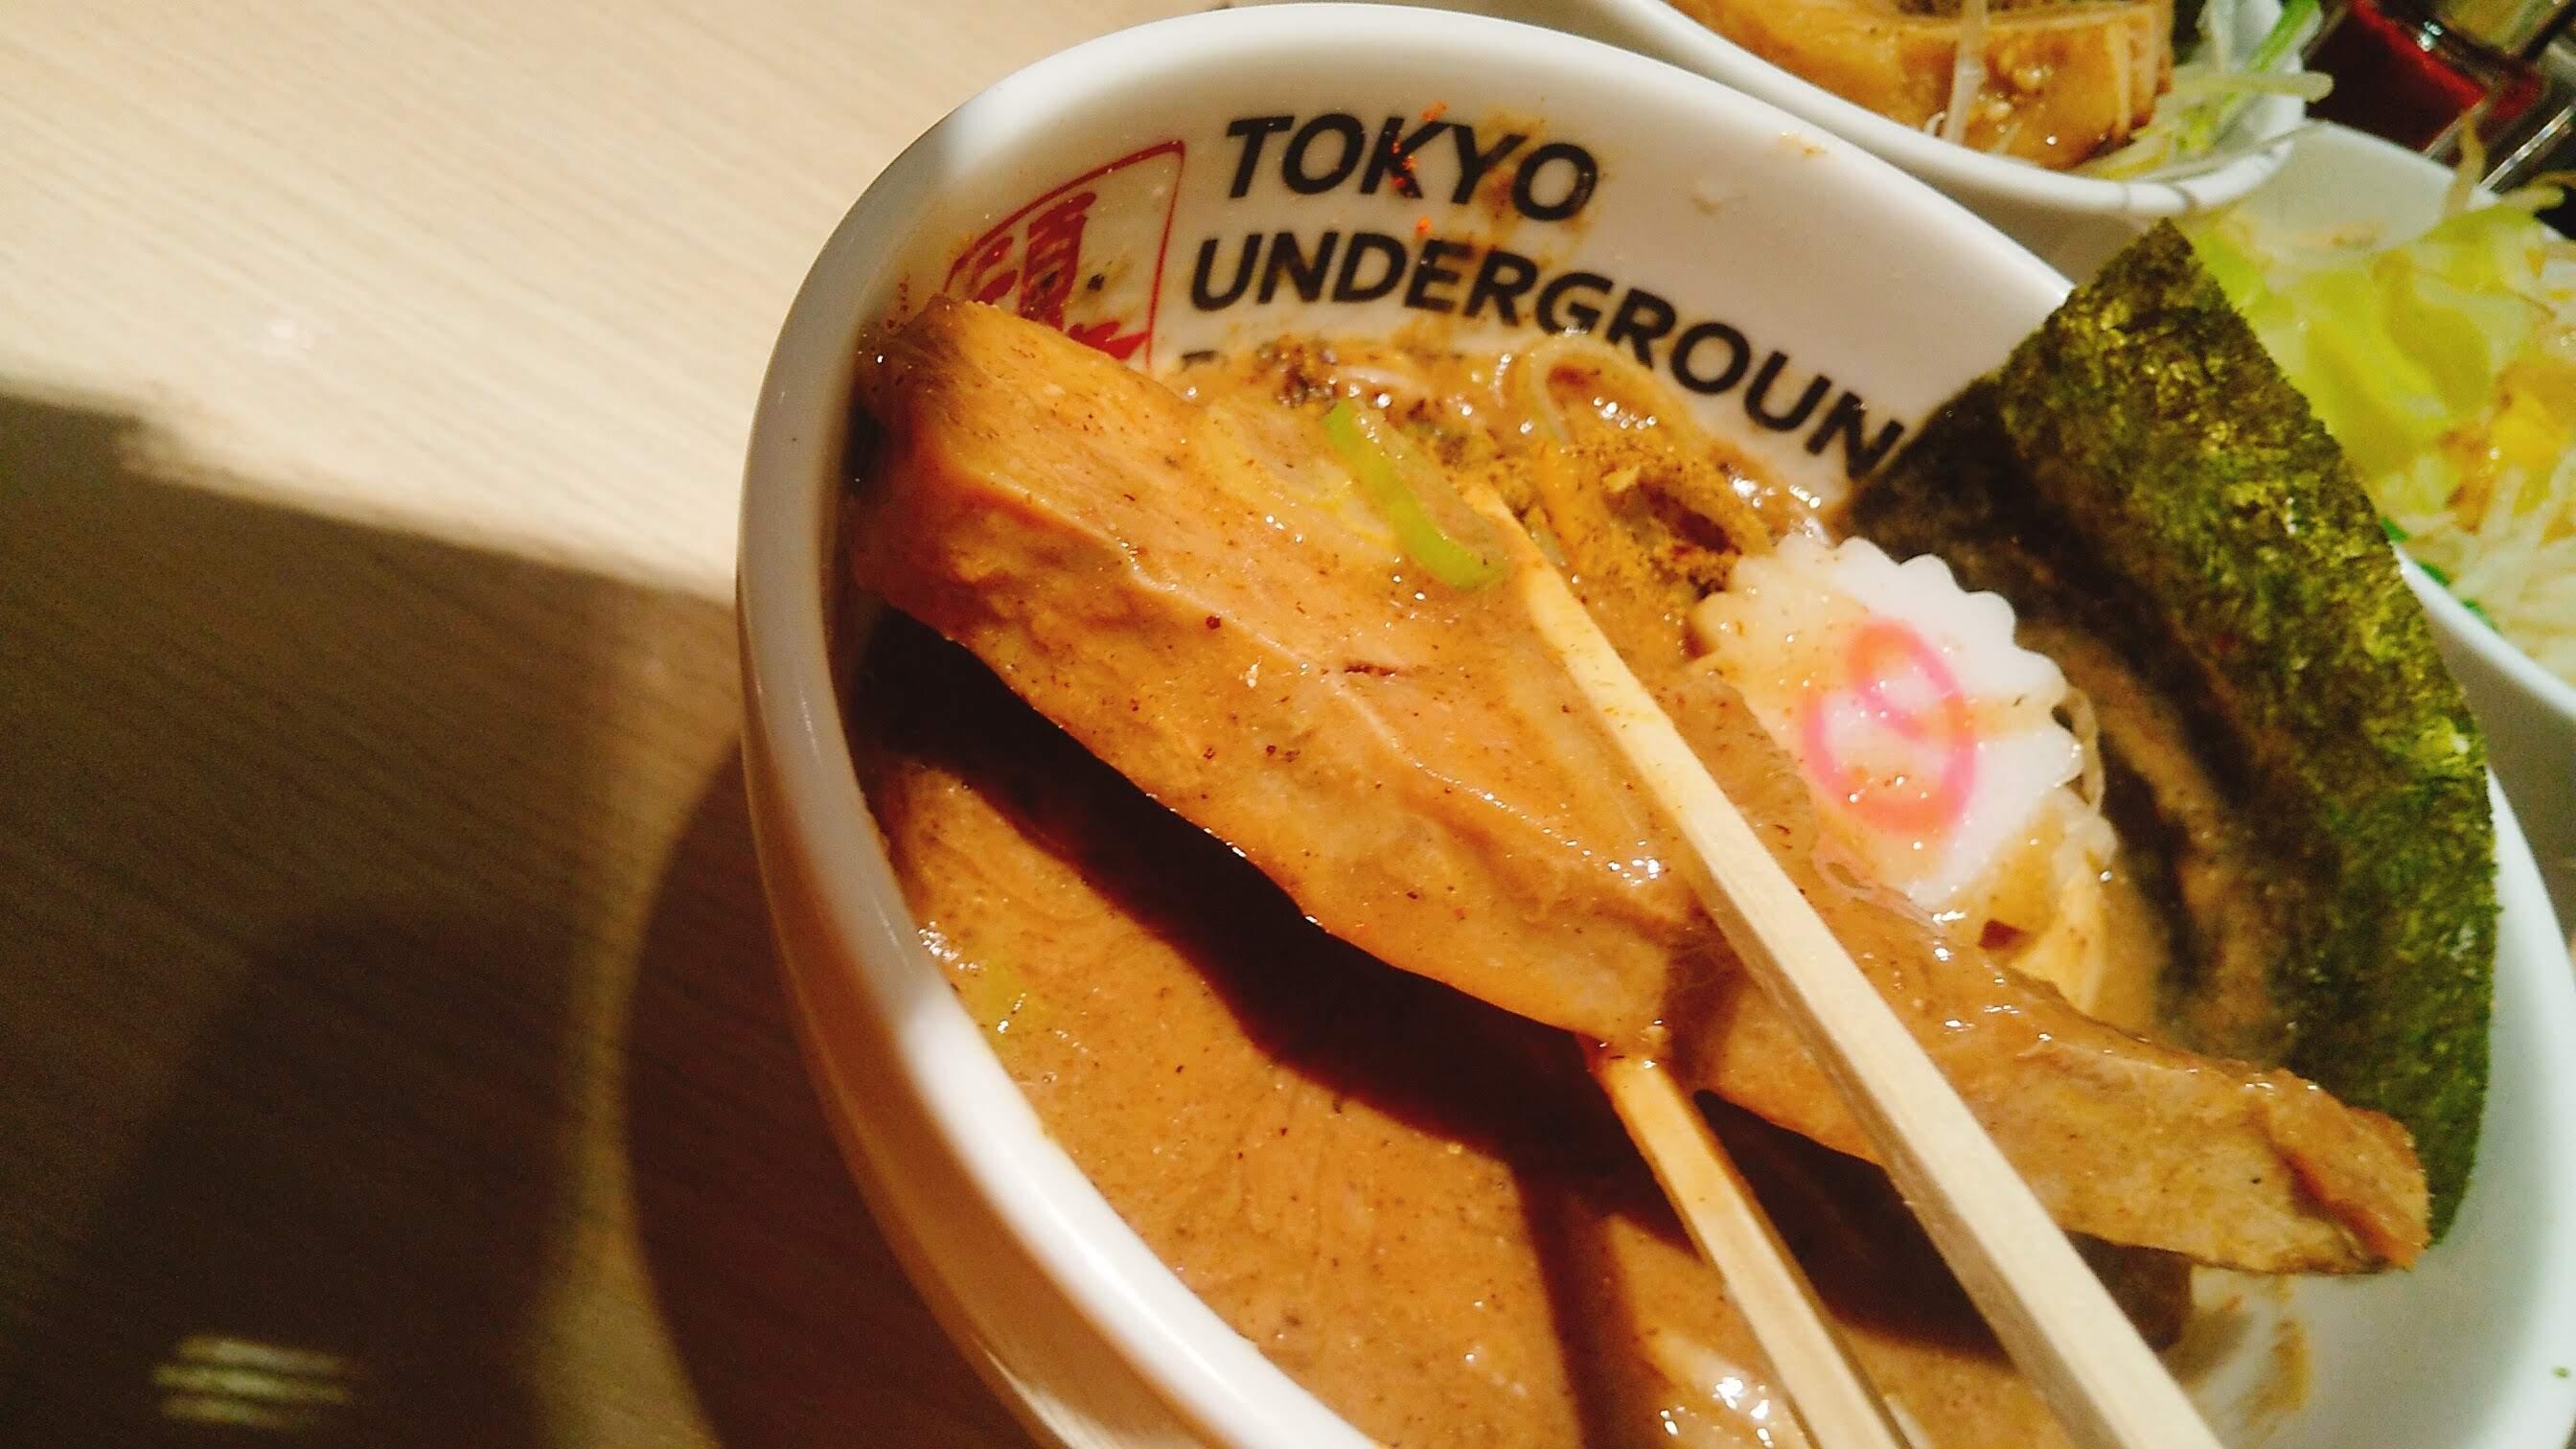 TOKYOUNDERGRAUNDRAMEN頑者の特製つけ麺のチャーシューアップの写真